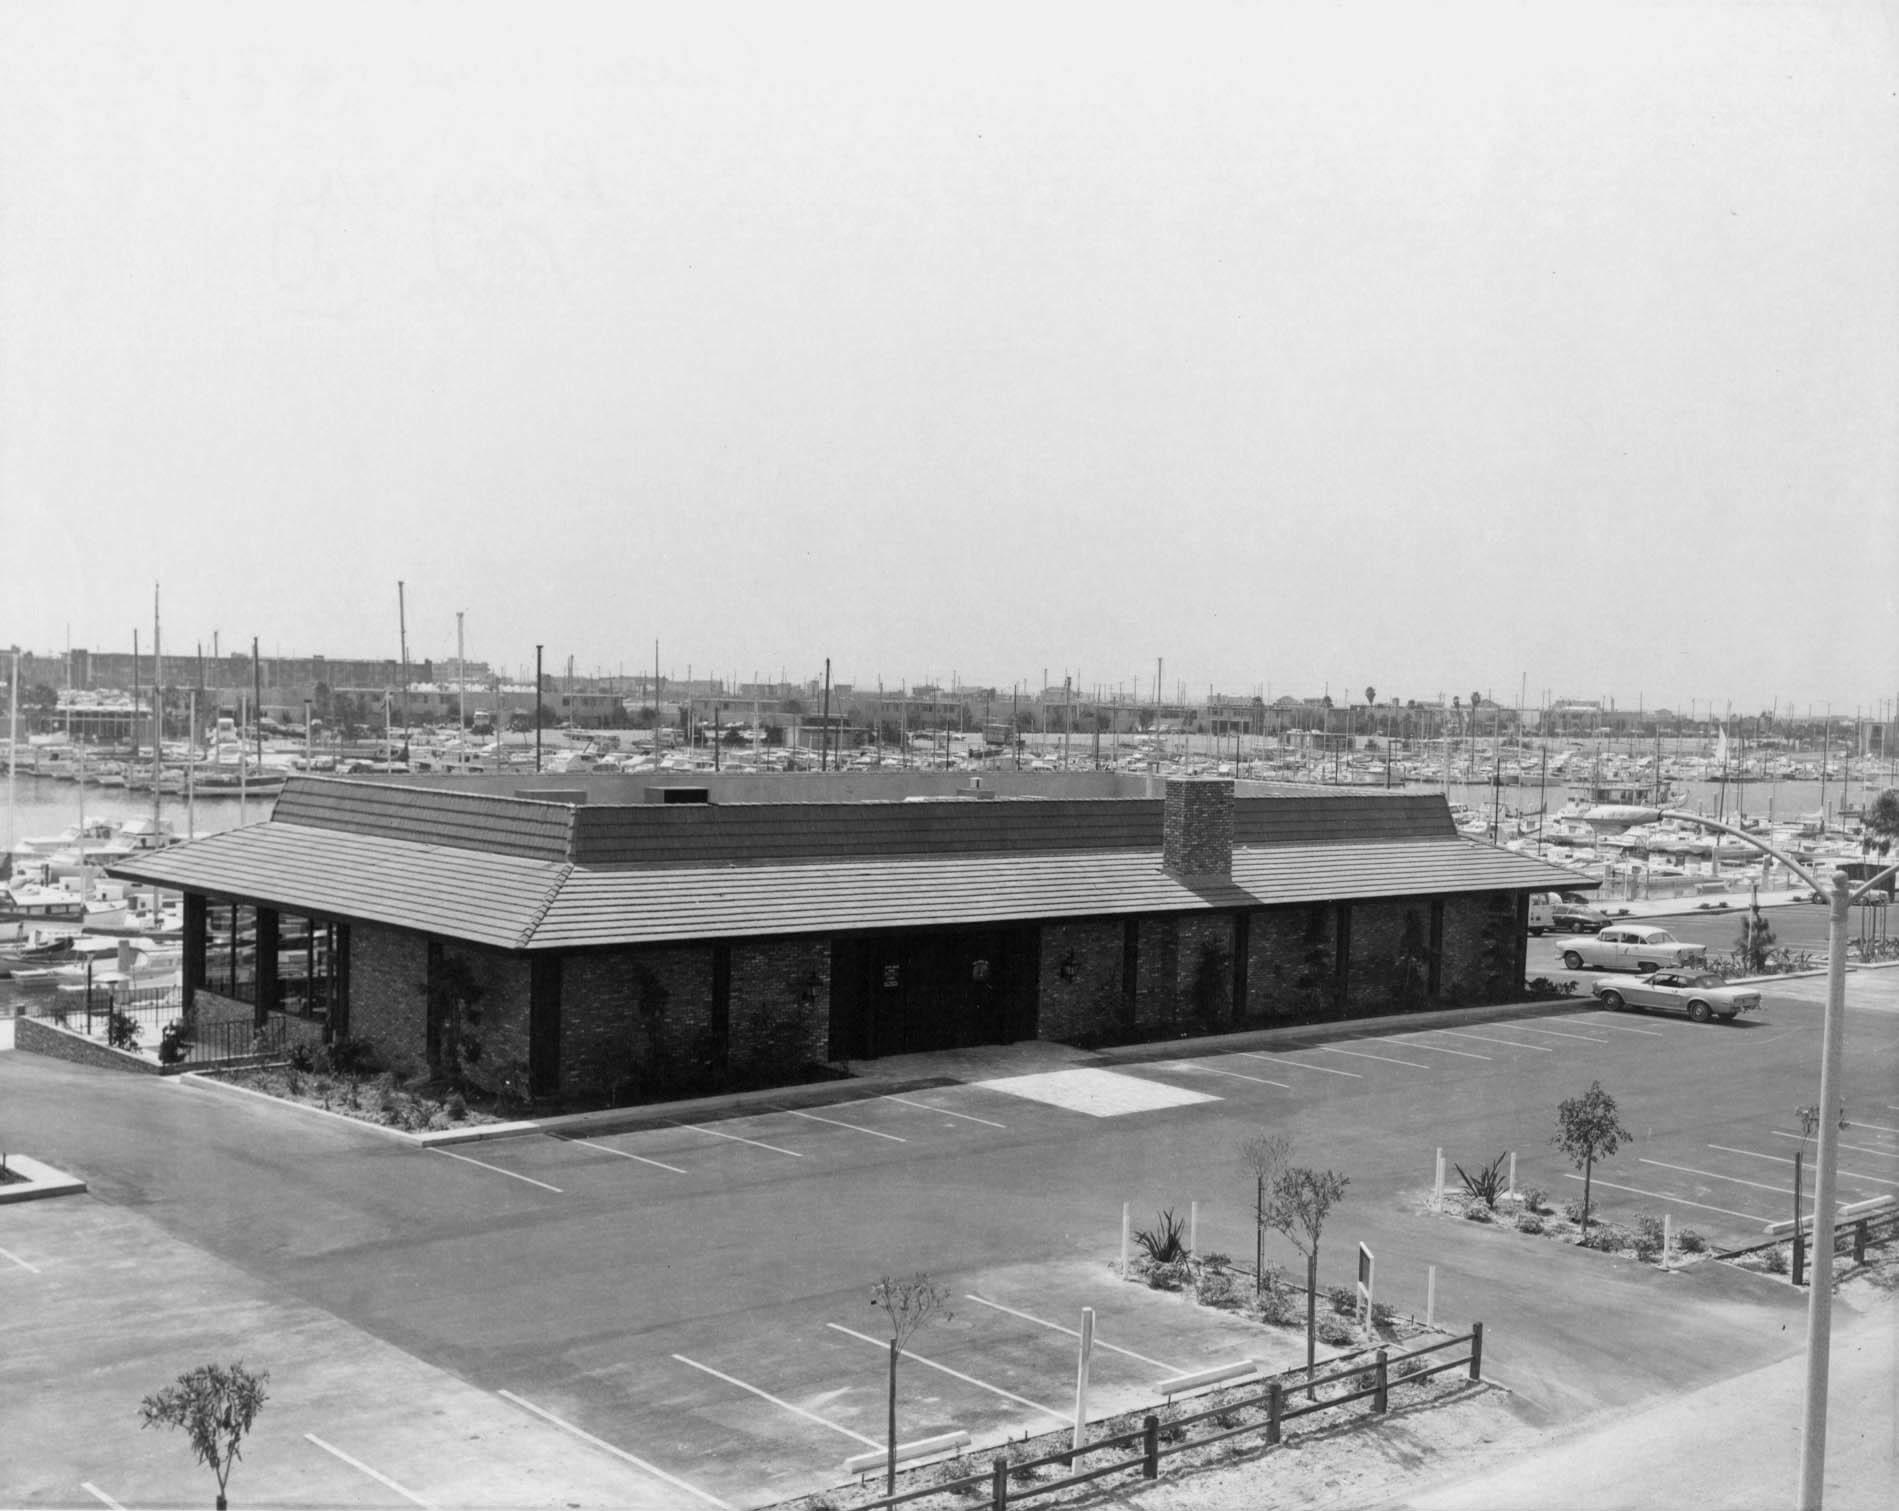 hm235bw-charthouse-restaurant-panay-wayc-basin-1967